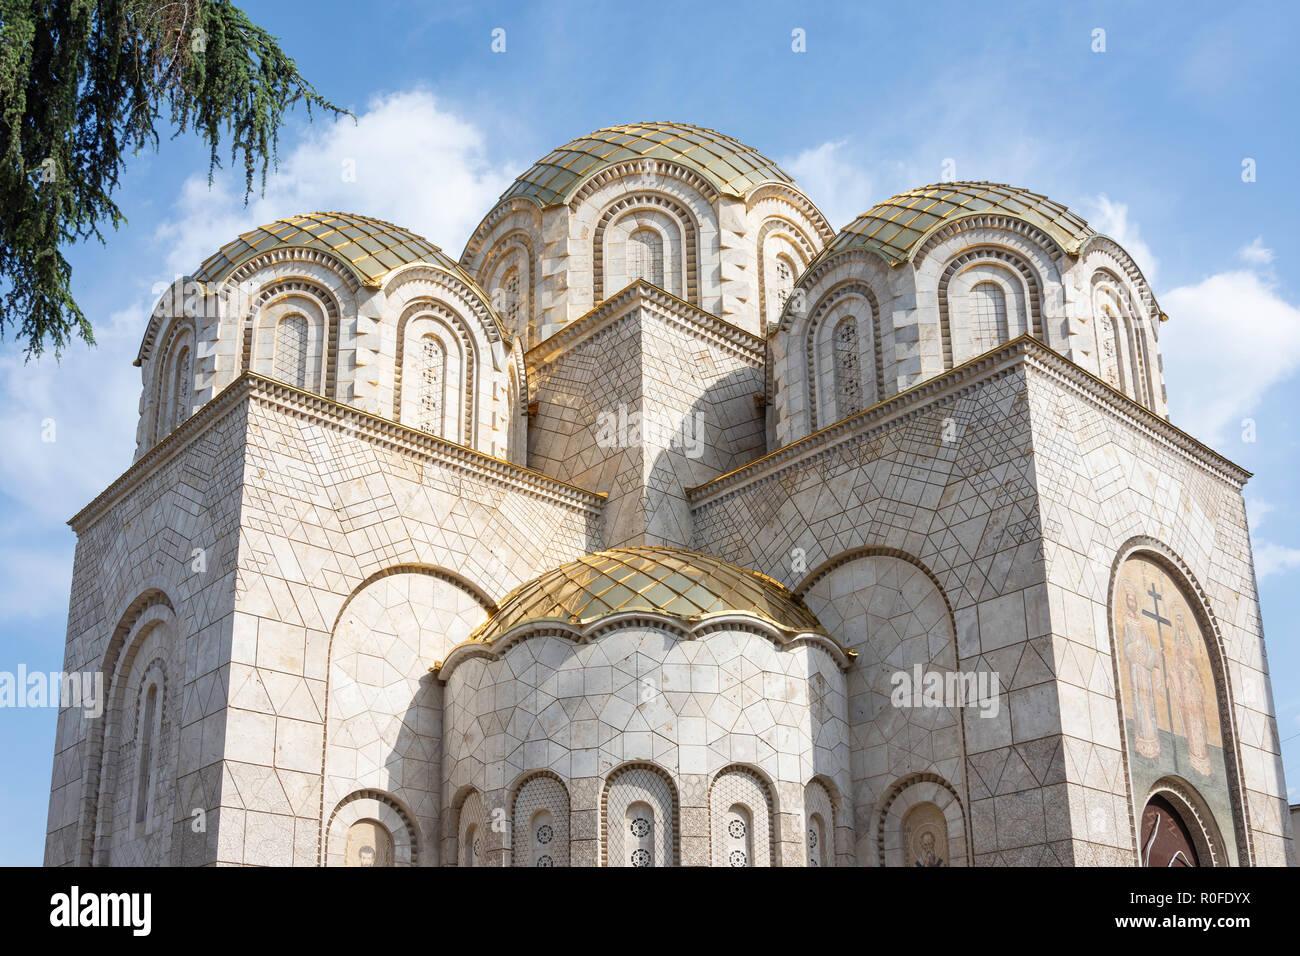 St. Constantine and Elena Church, Macedonia Street, Skopje, Skopje Region, Republic of Macedonia - Stock Image